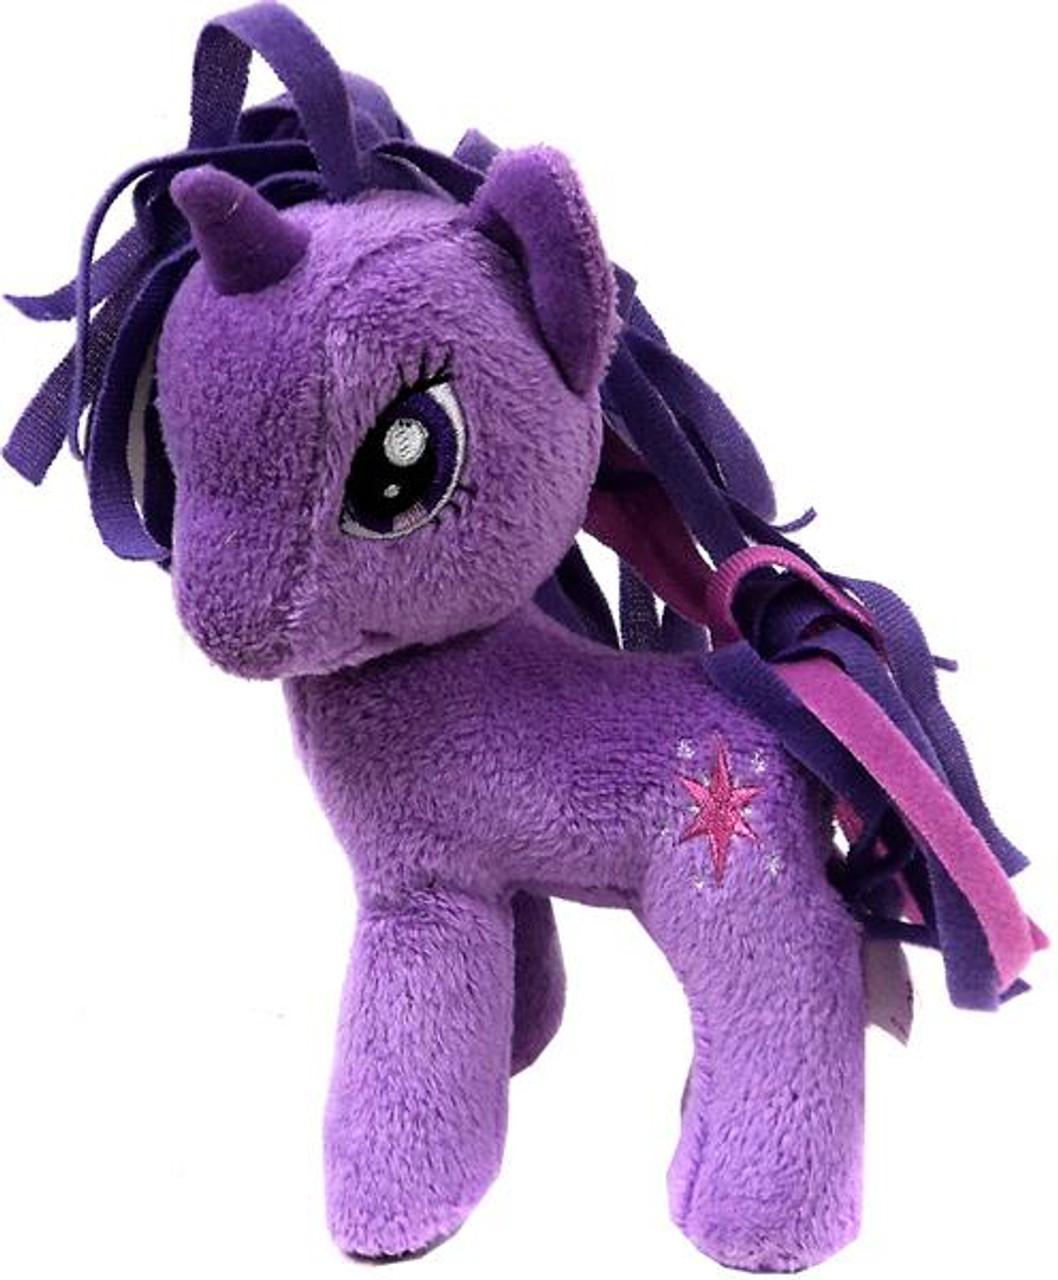 My Little Pony Friendship is Magic 5 Inch Twilight Sparkle Plush